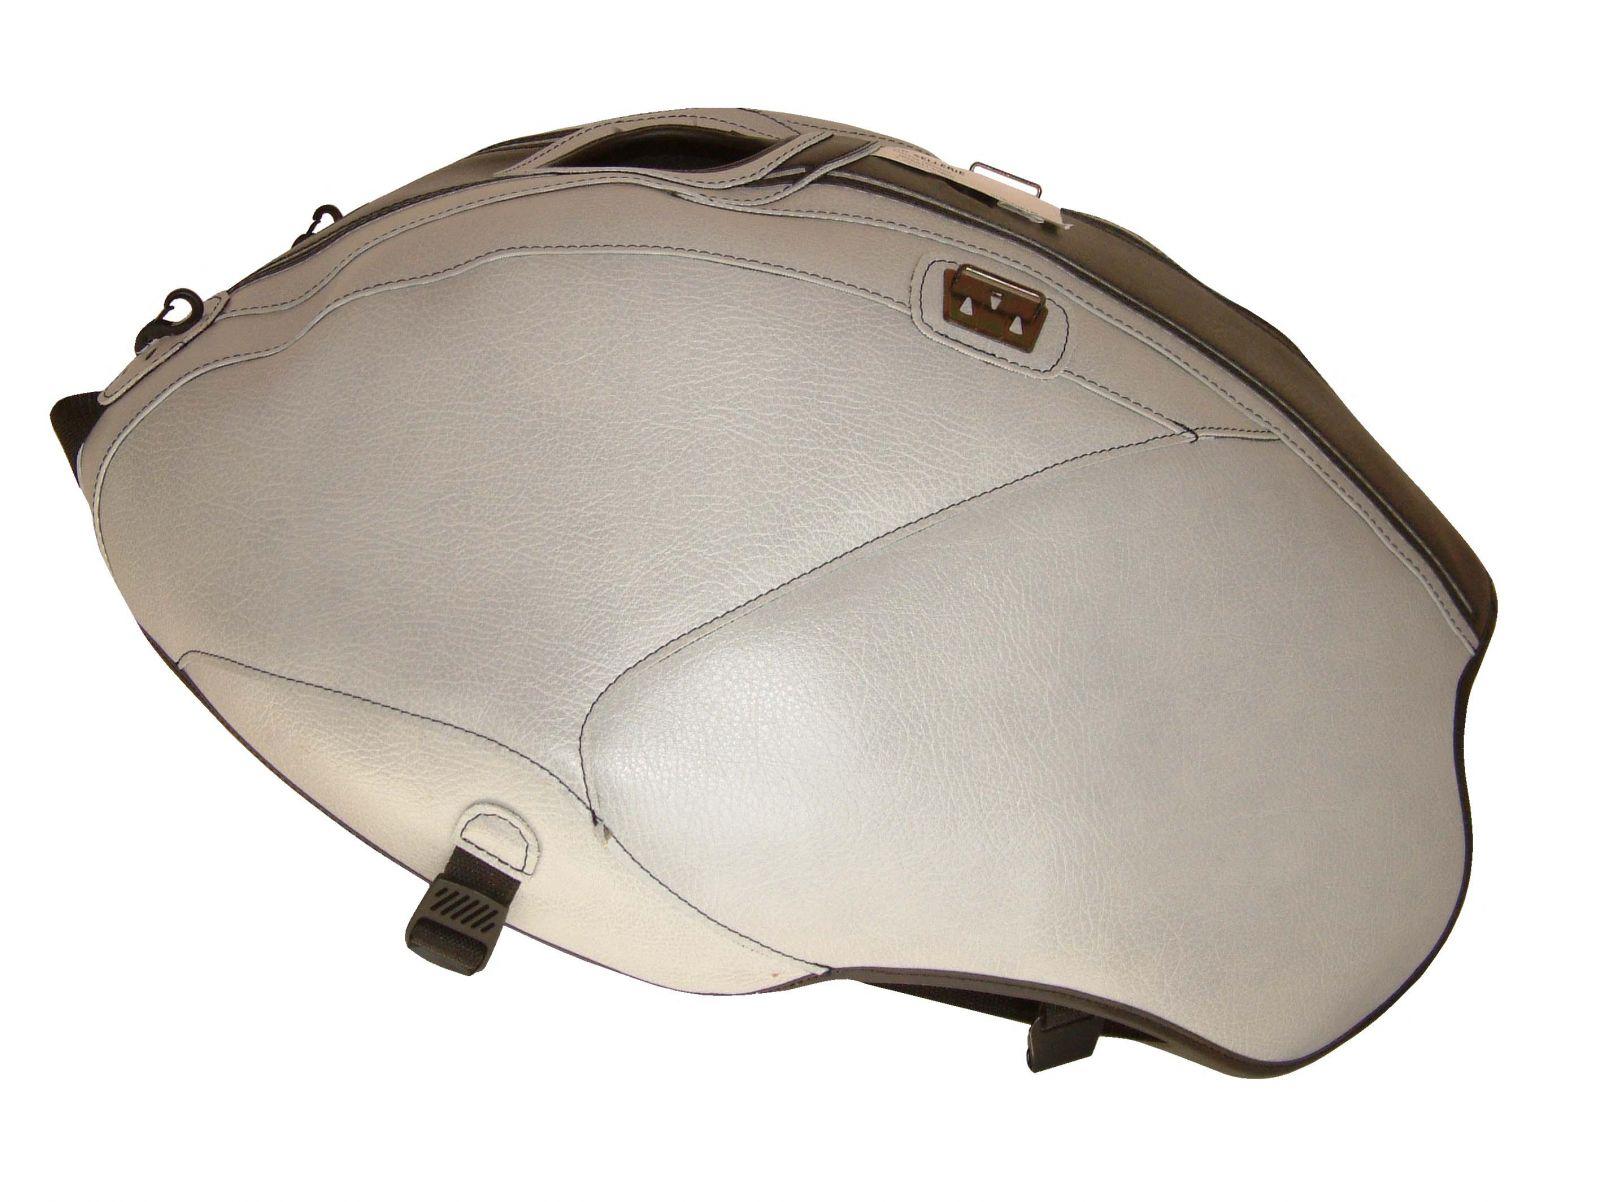 Tapis protège-réservoir TPR4932 - DUCATI 800 S2R